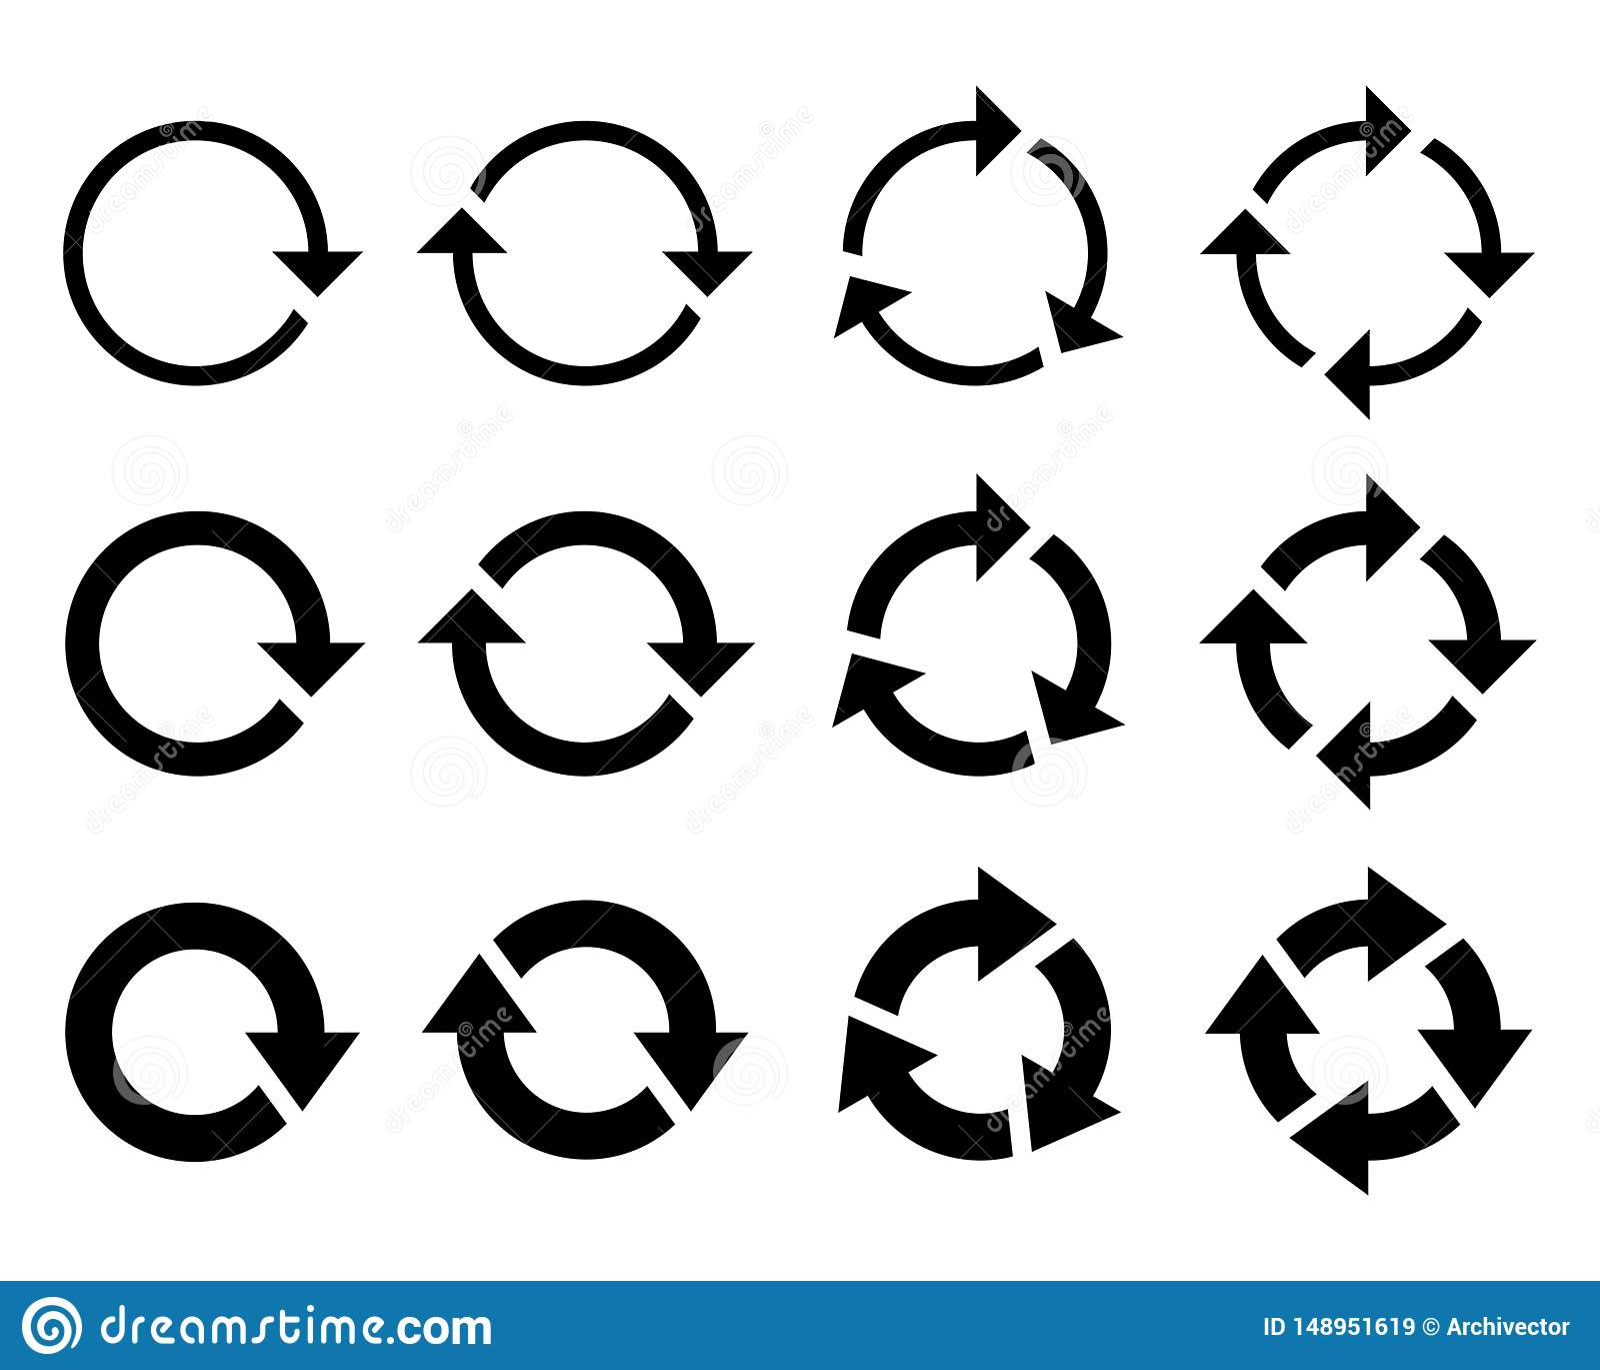 Arrows round set graphic icons. Rotation symbols